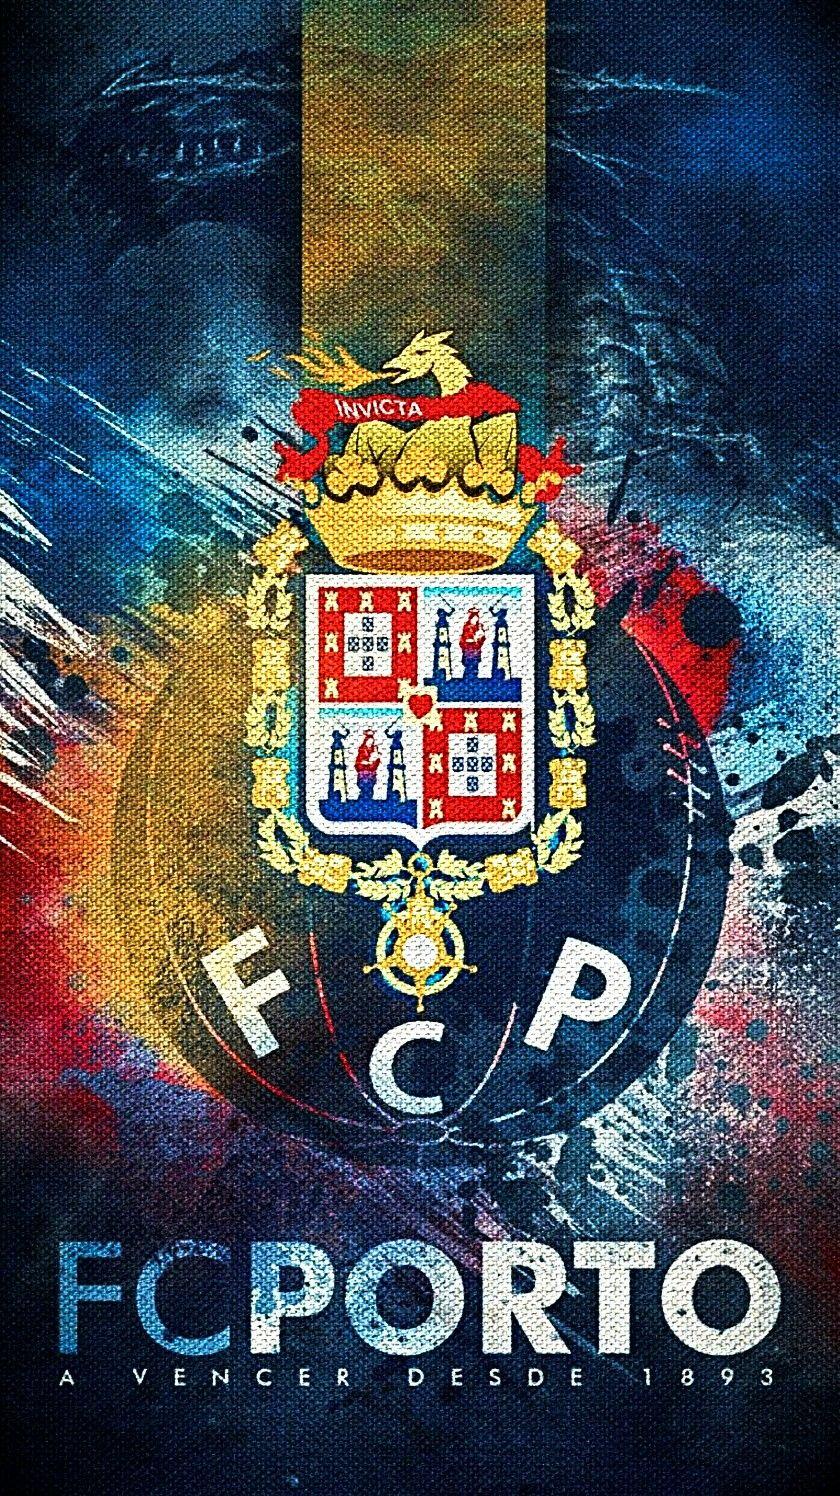 Pin De George Kalisperides Em Wallpapers Fcporto Wallpaper Futebol Clube Do Porto Estadio Futebol